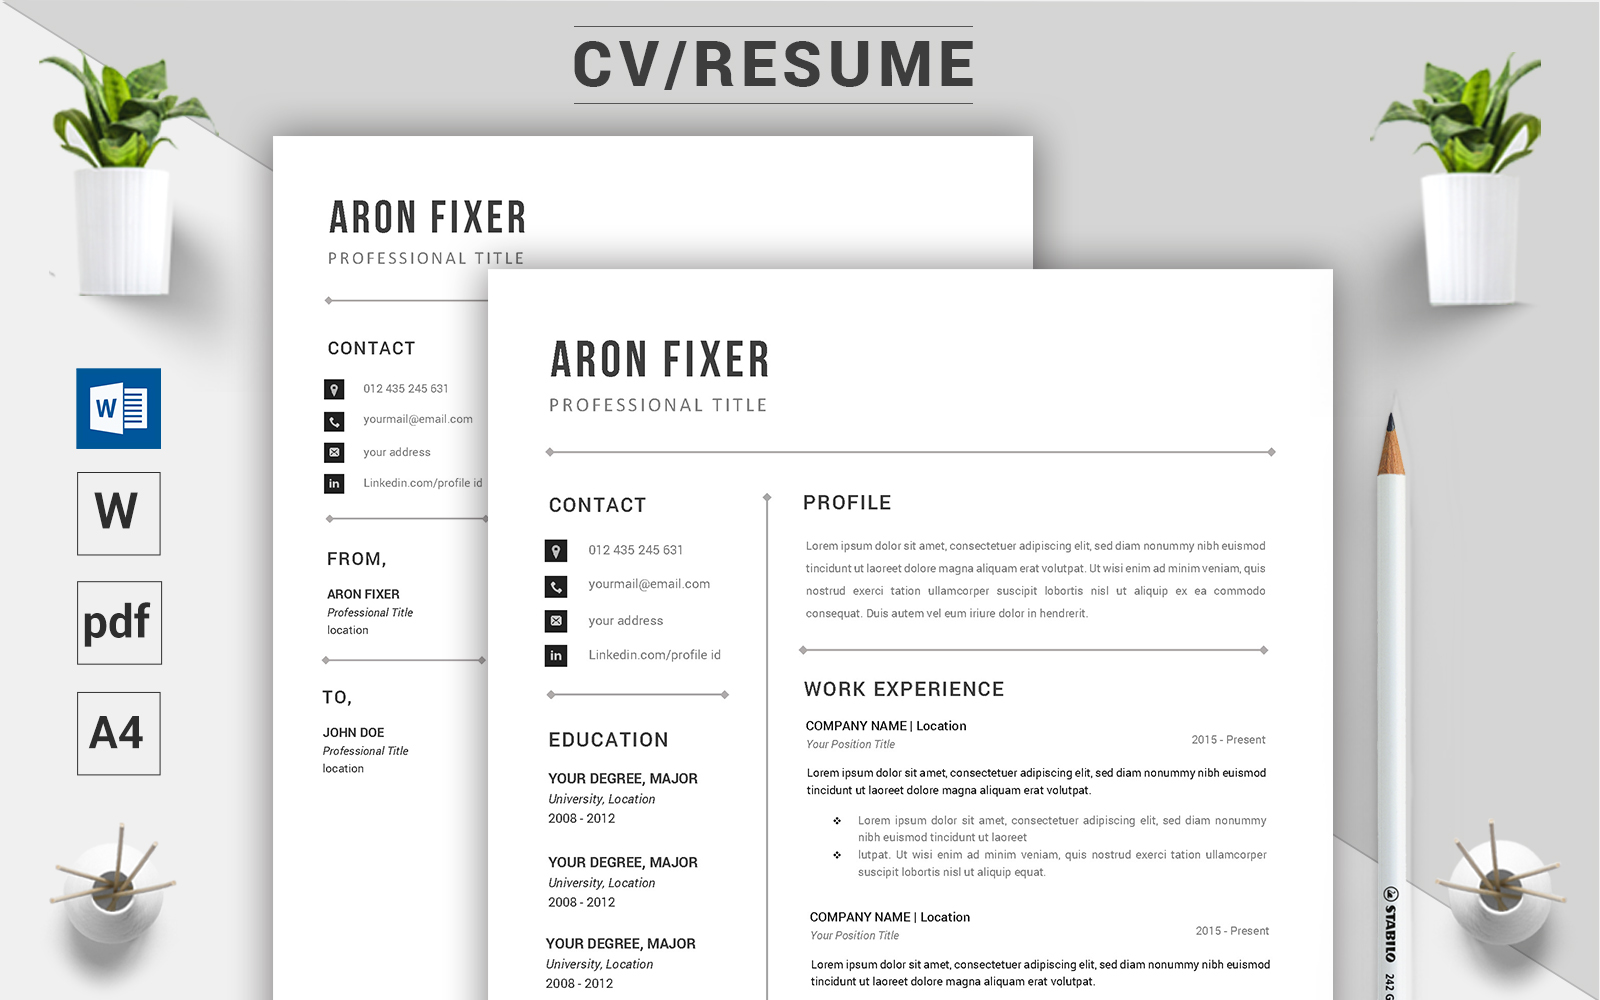 Szablon resume Aron Fixer - CV #124500